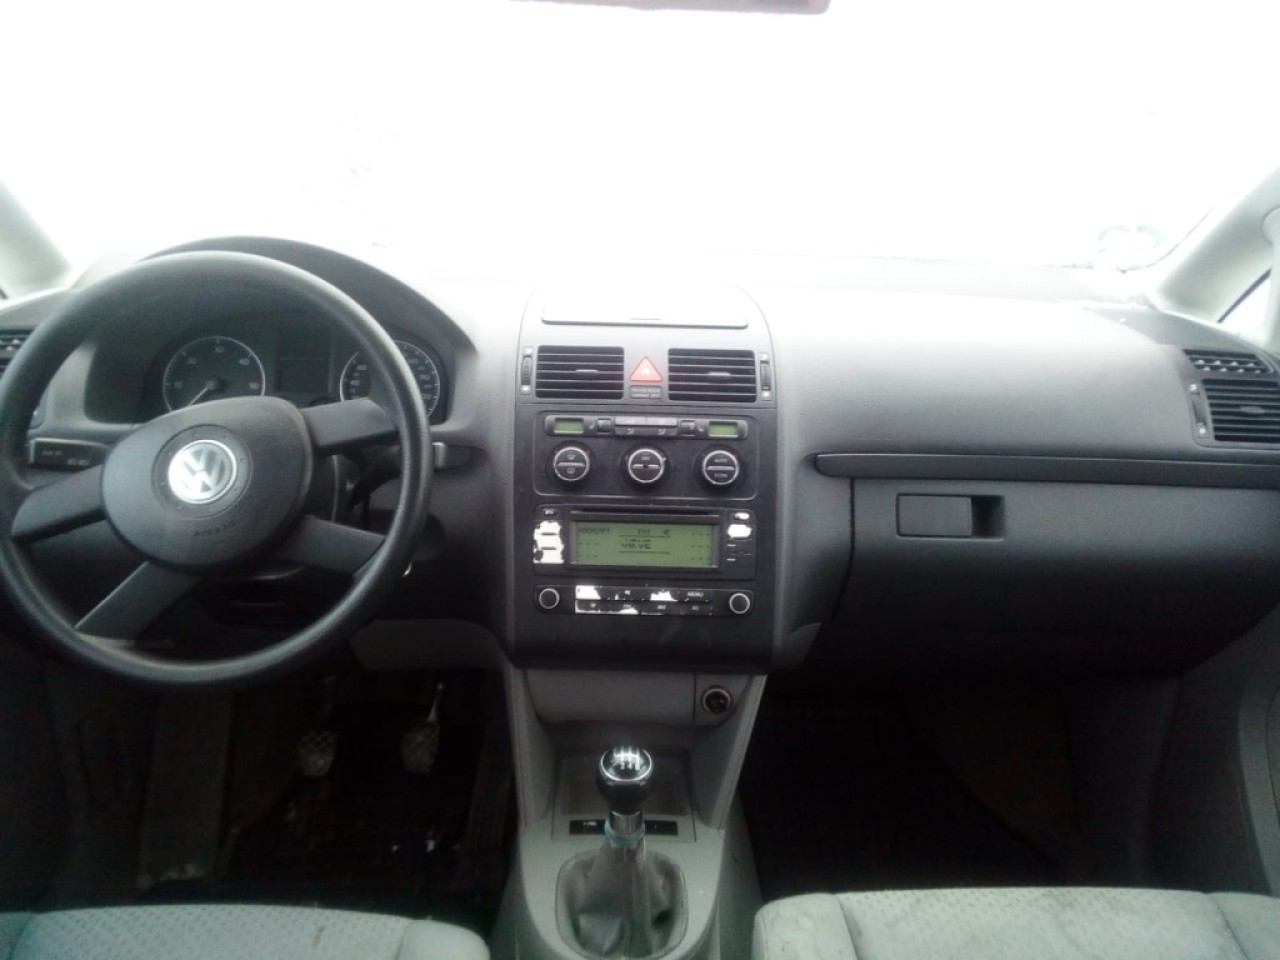 Ceasuri bord VW Touran 2003 Monovolum 1.9 TDI